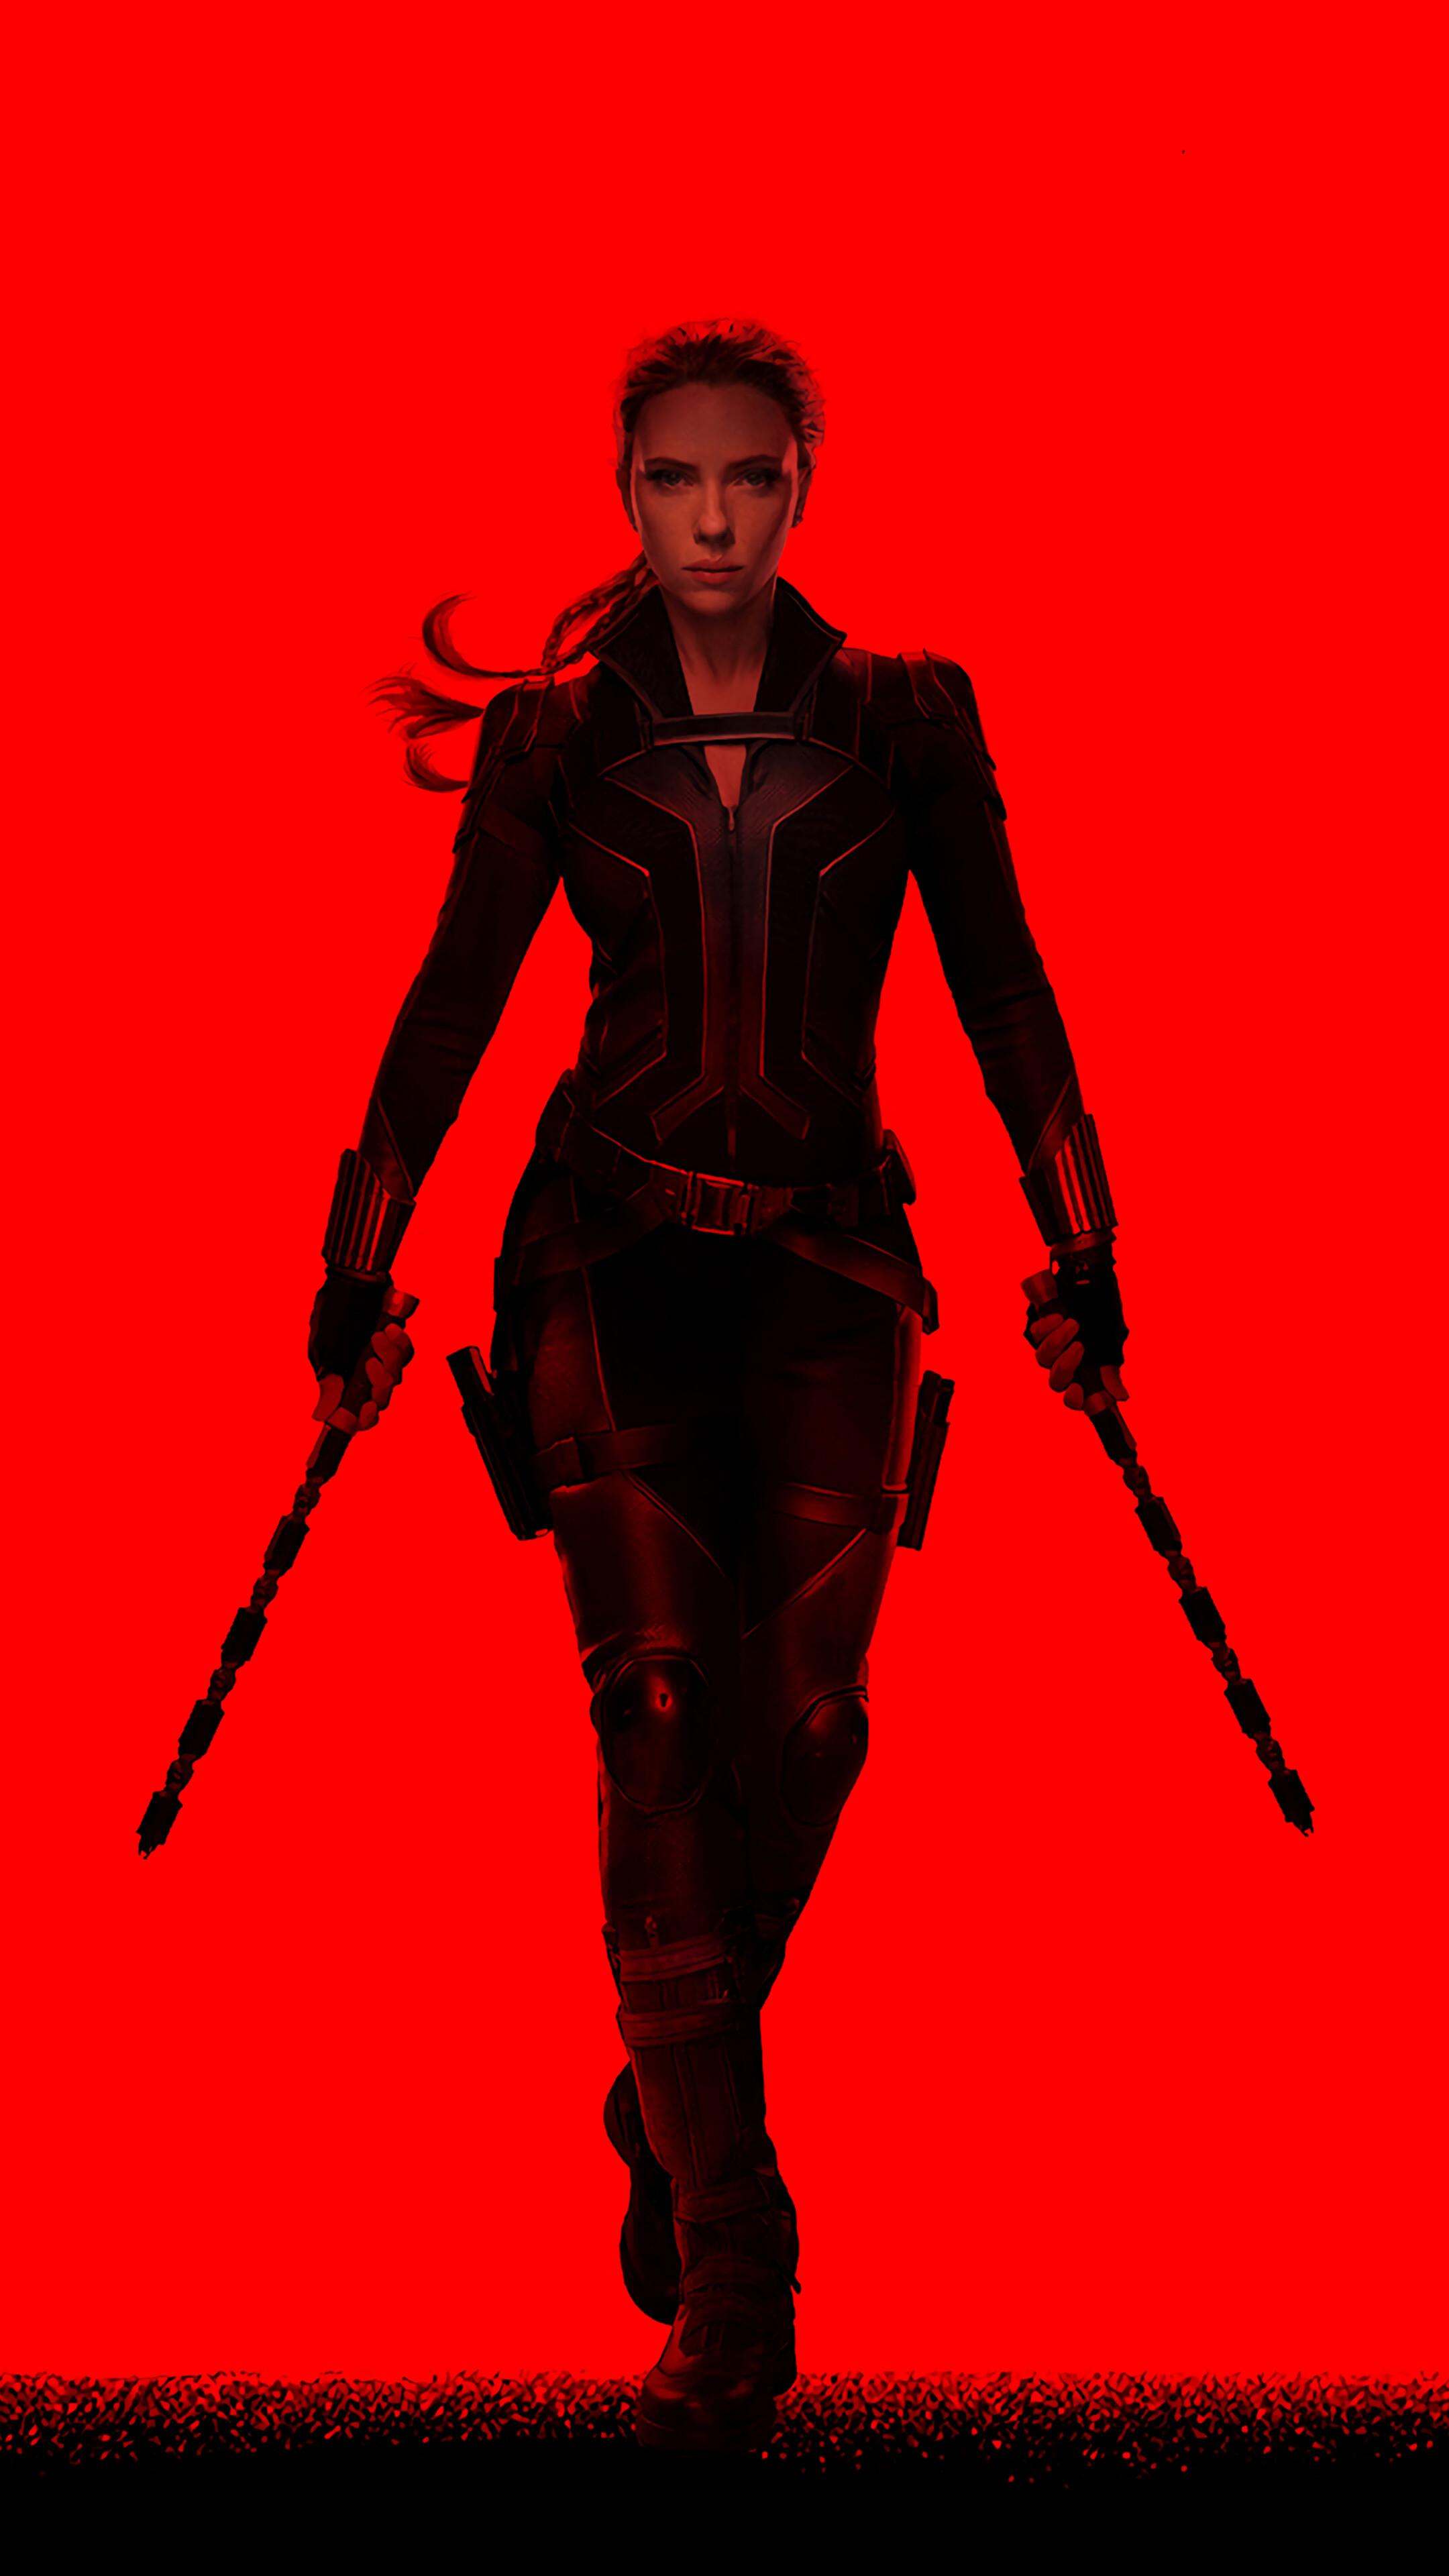 download 47] Black Widow 2020 Wallpapers on WallpaperSafari 2160x3840